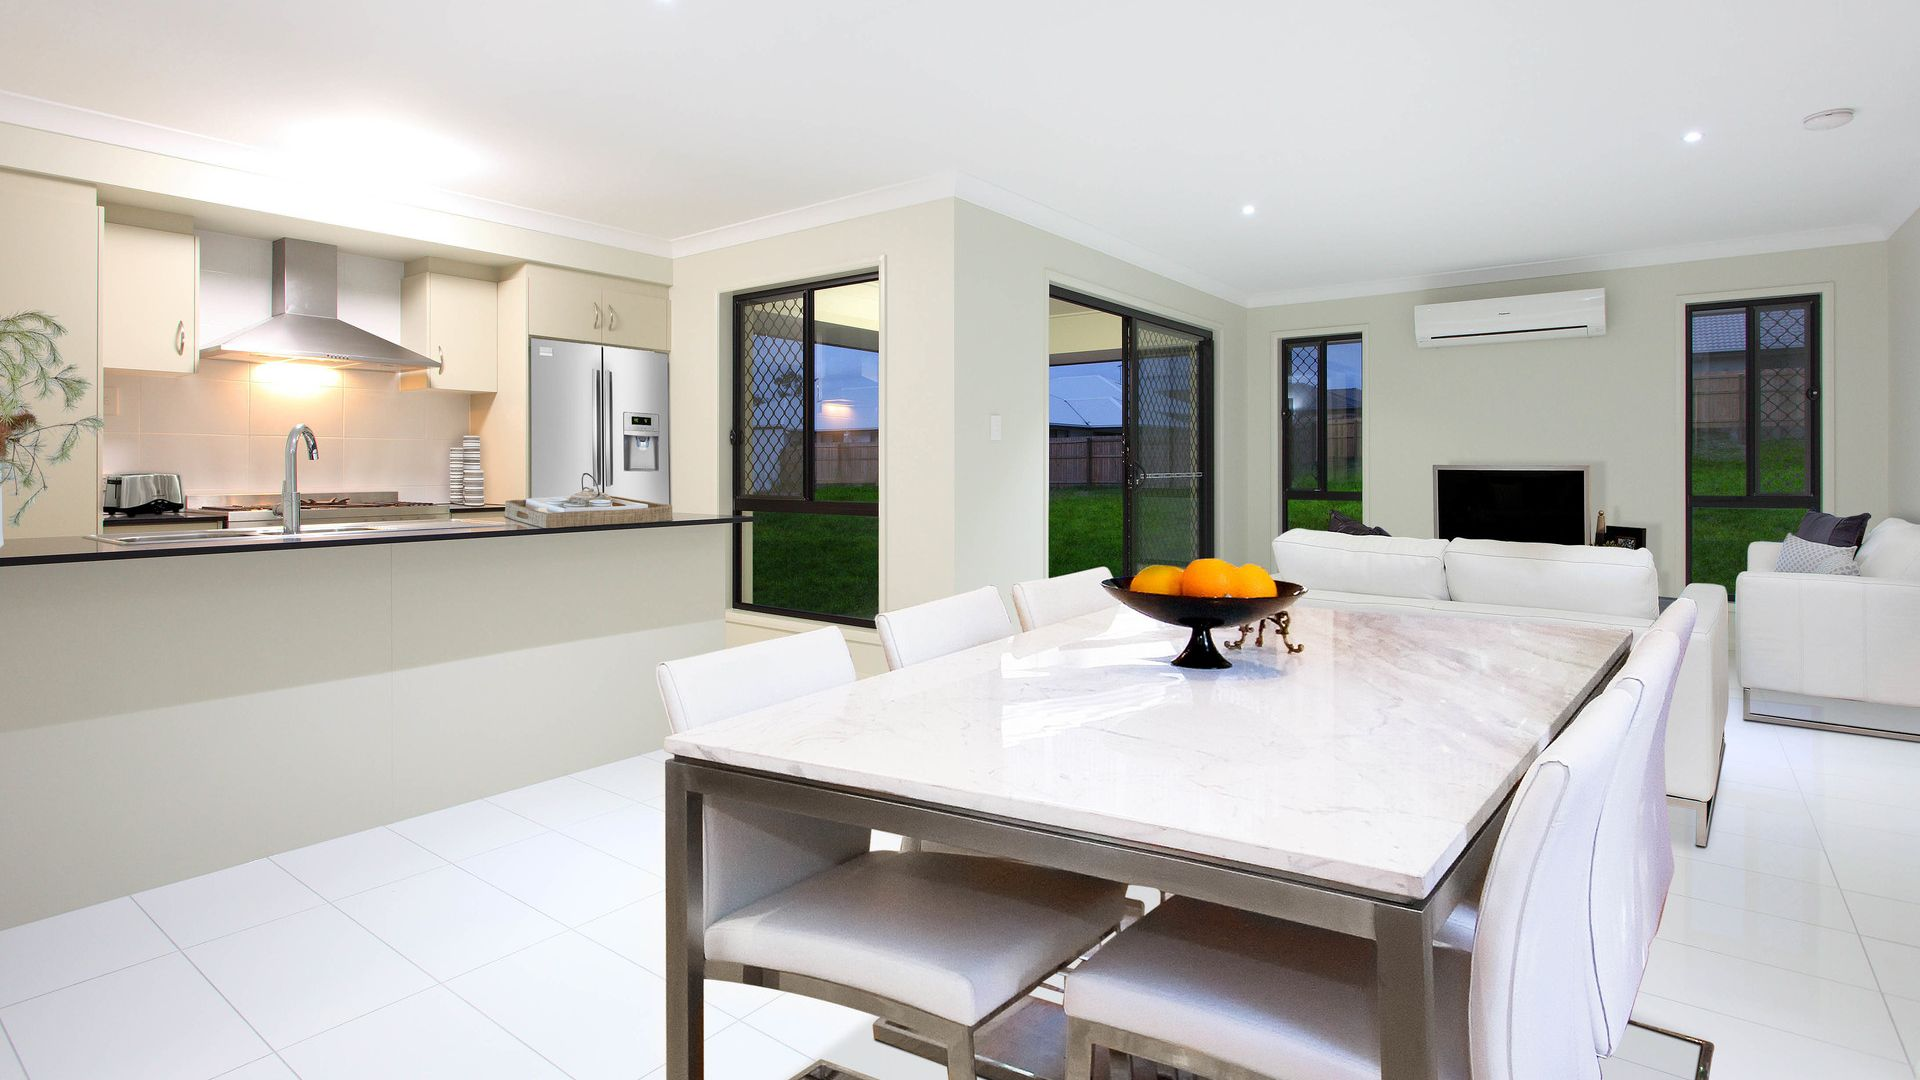 Lot 130 Hayfield Estate, Ripley QLD 4306, Image 2